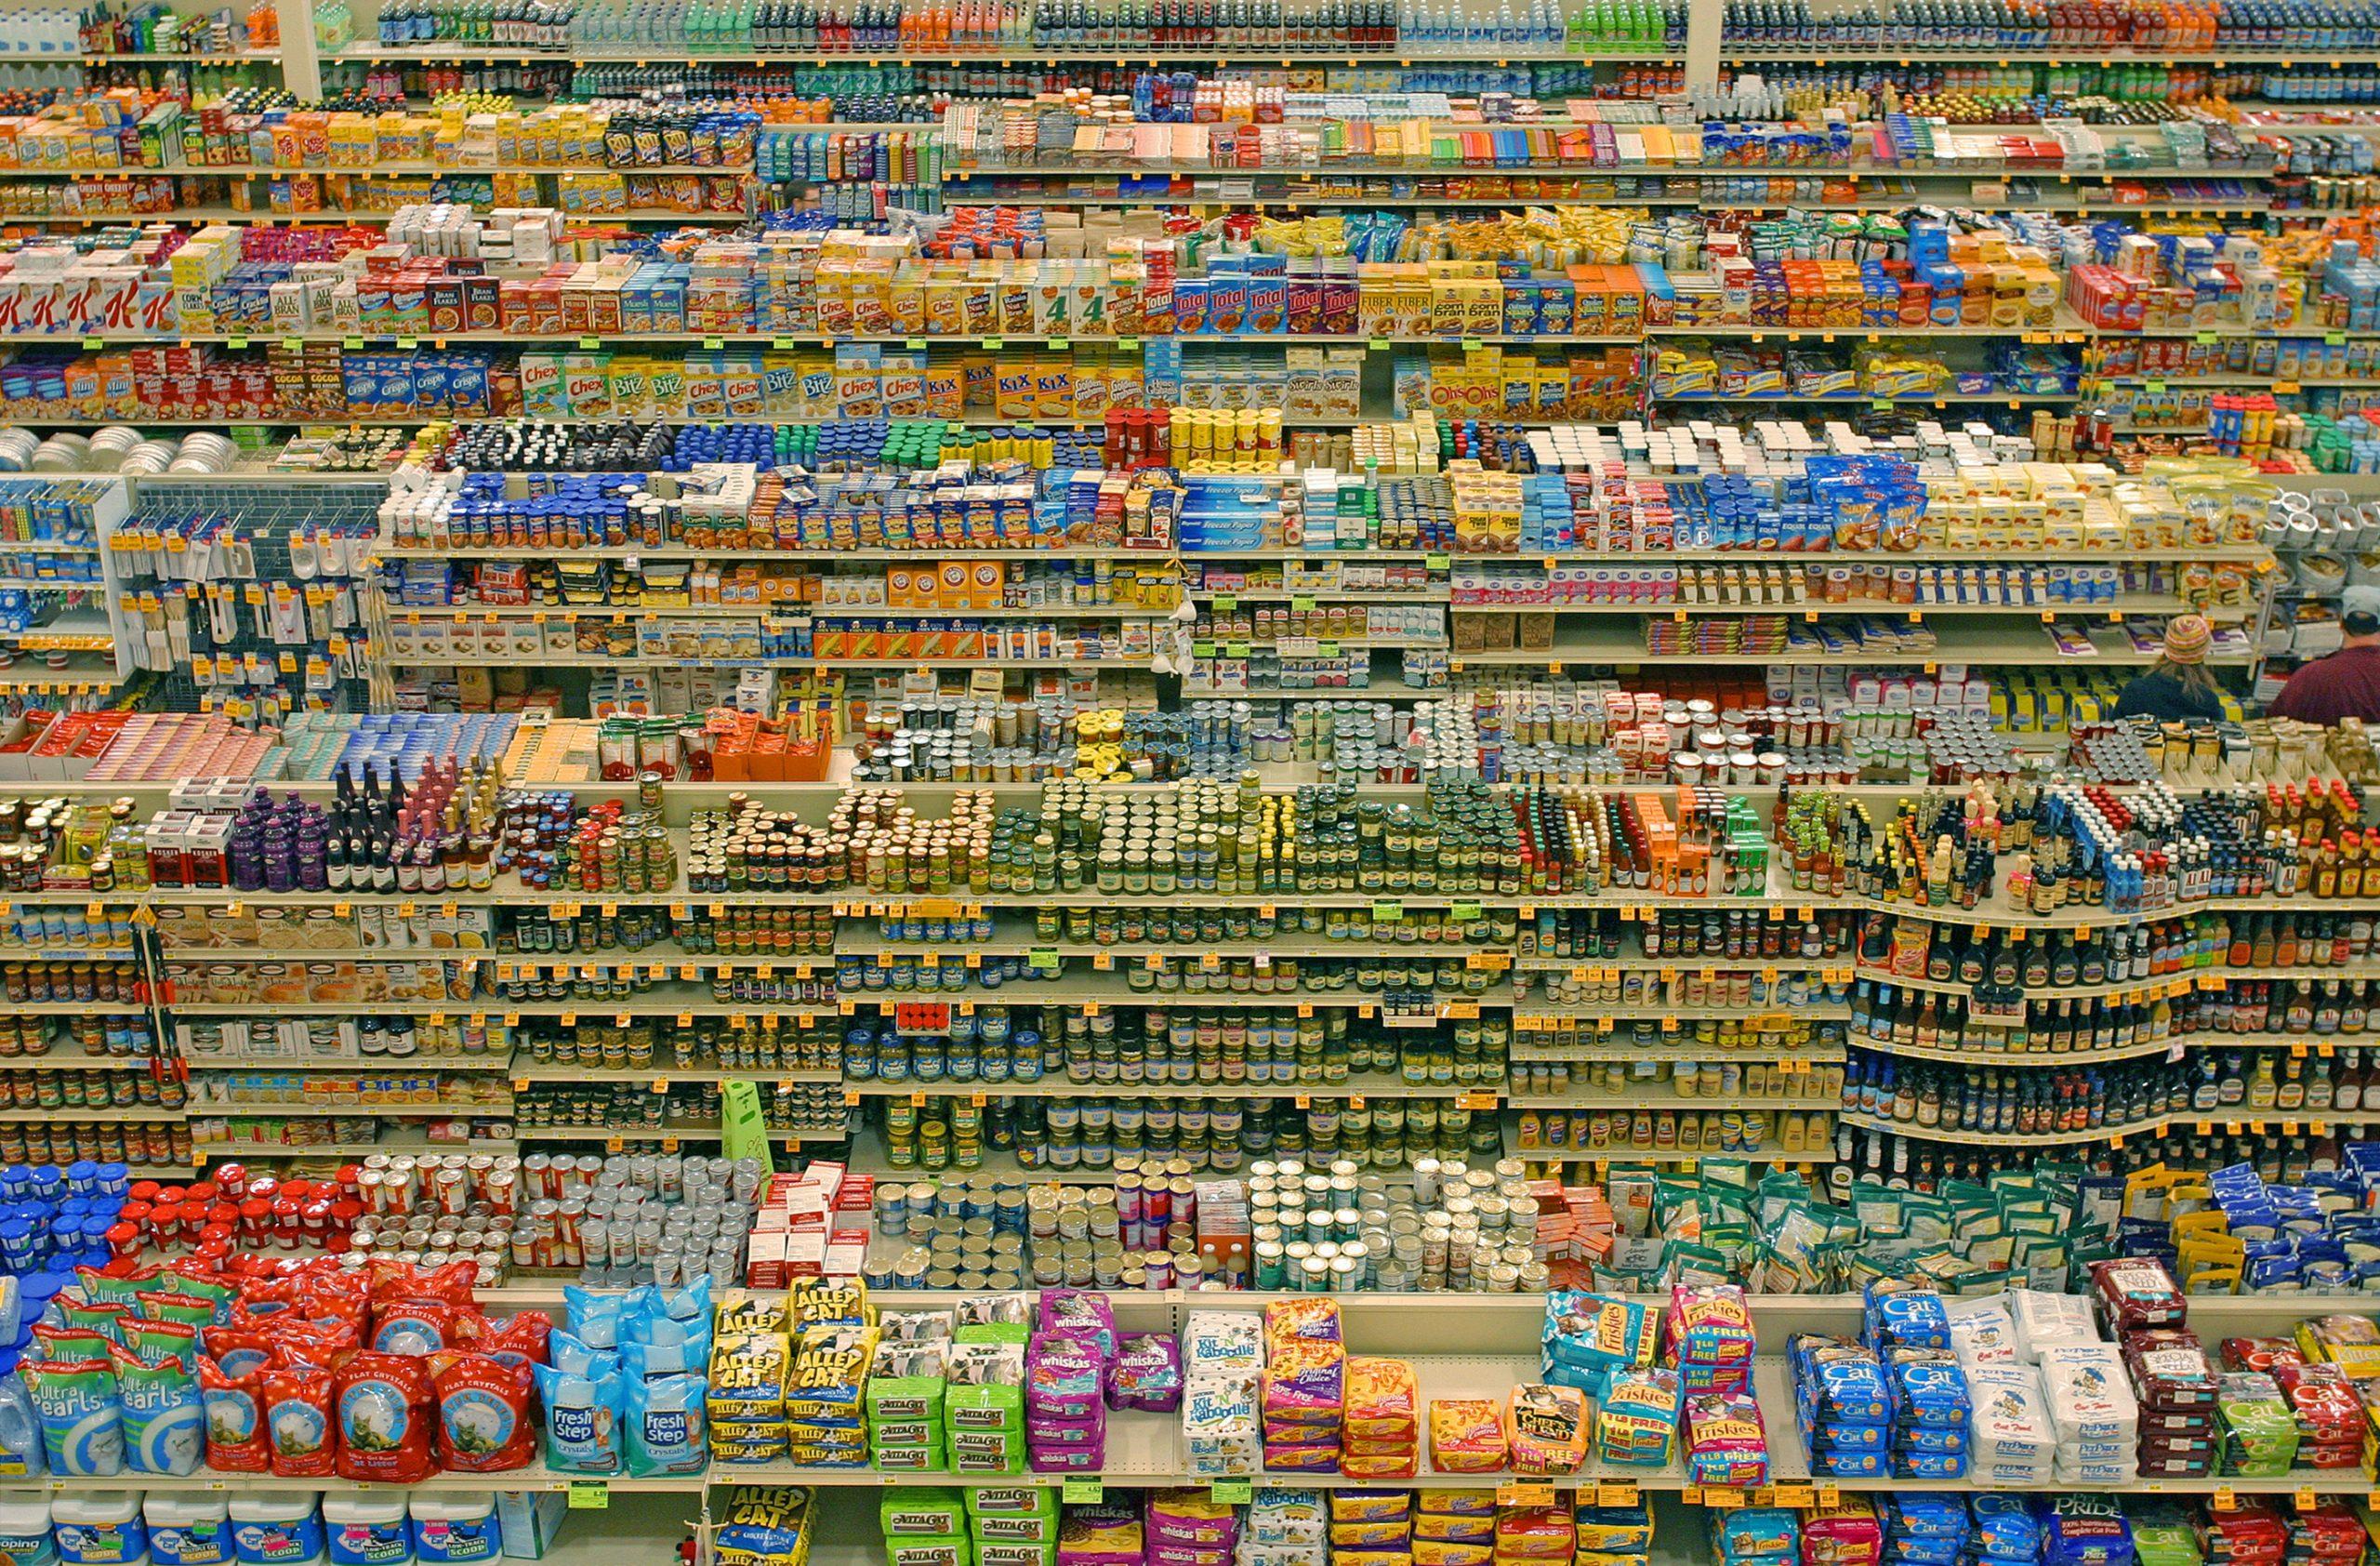 Indian Food & Beverages Sector